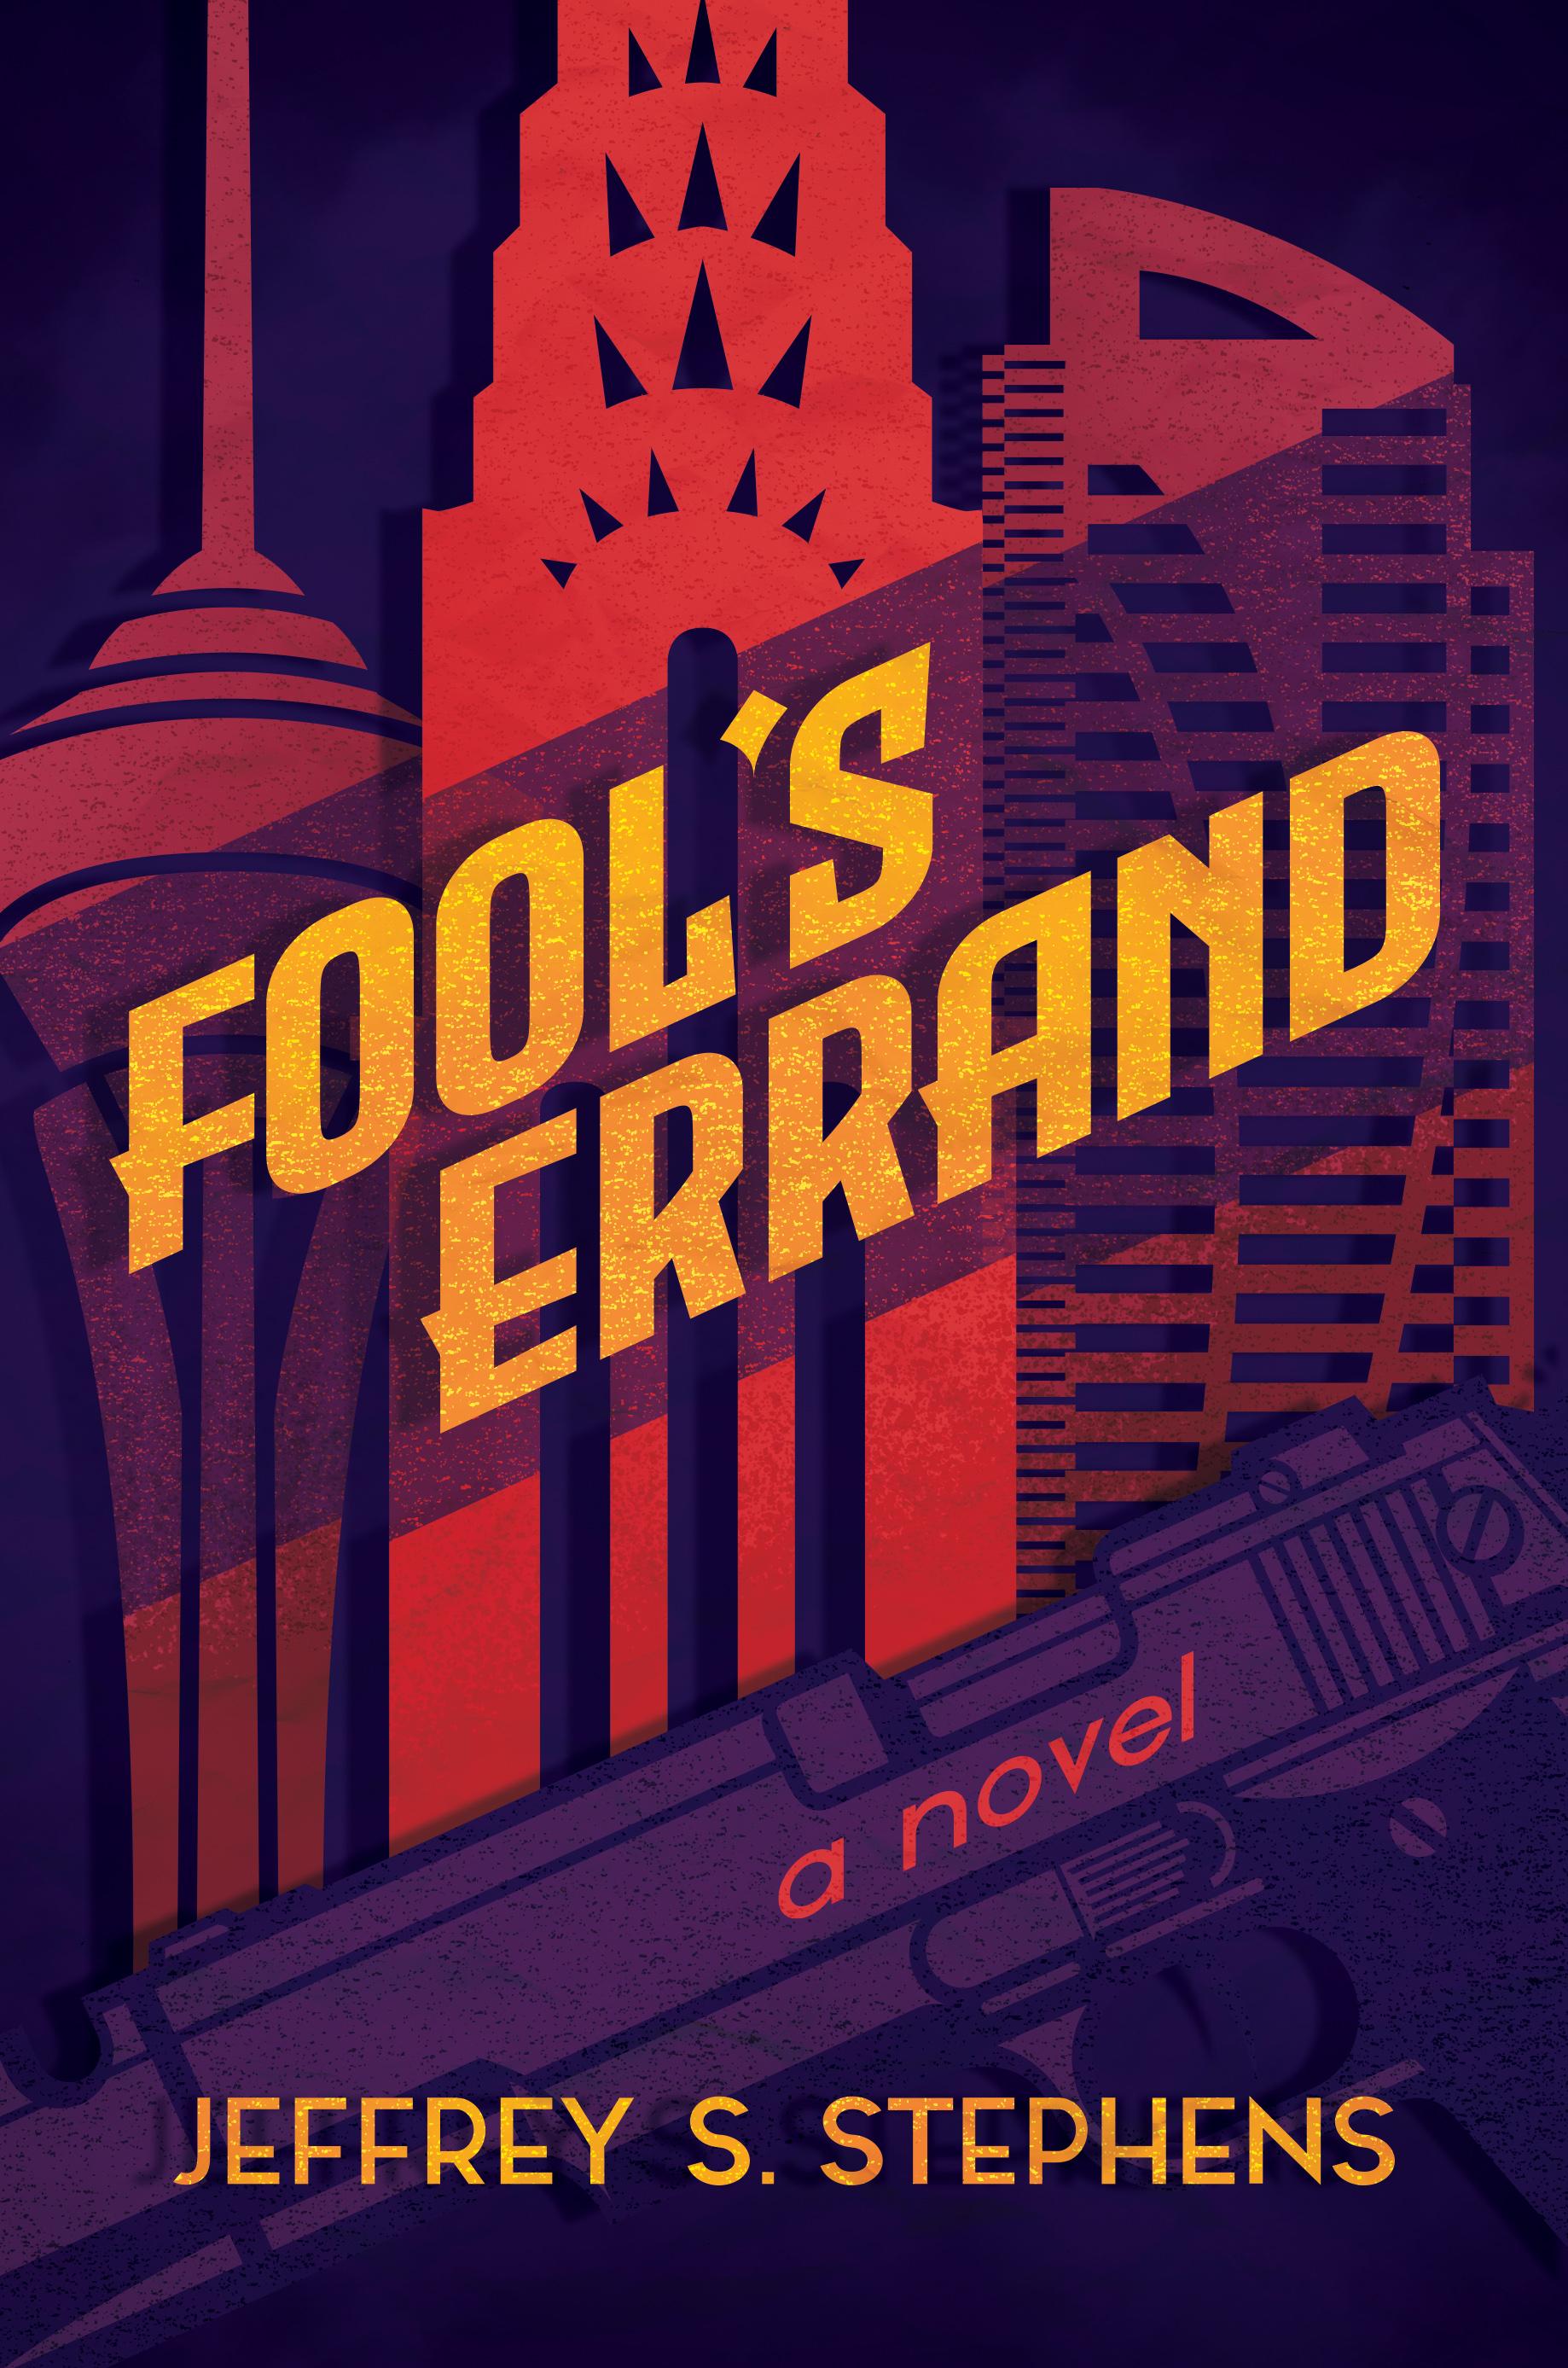 Jeffrey Stephens - Fool's Errand